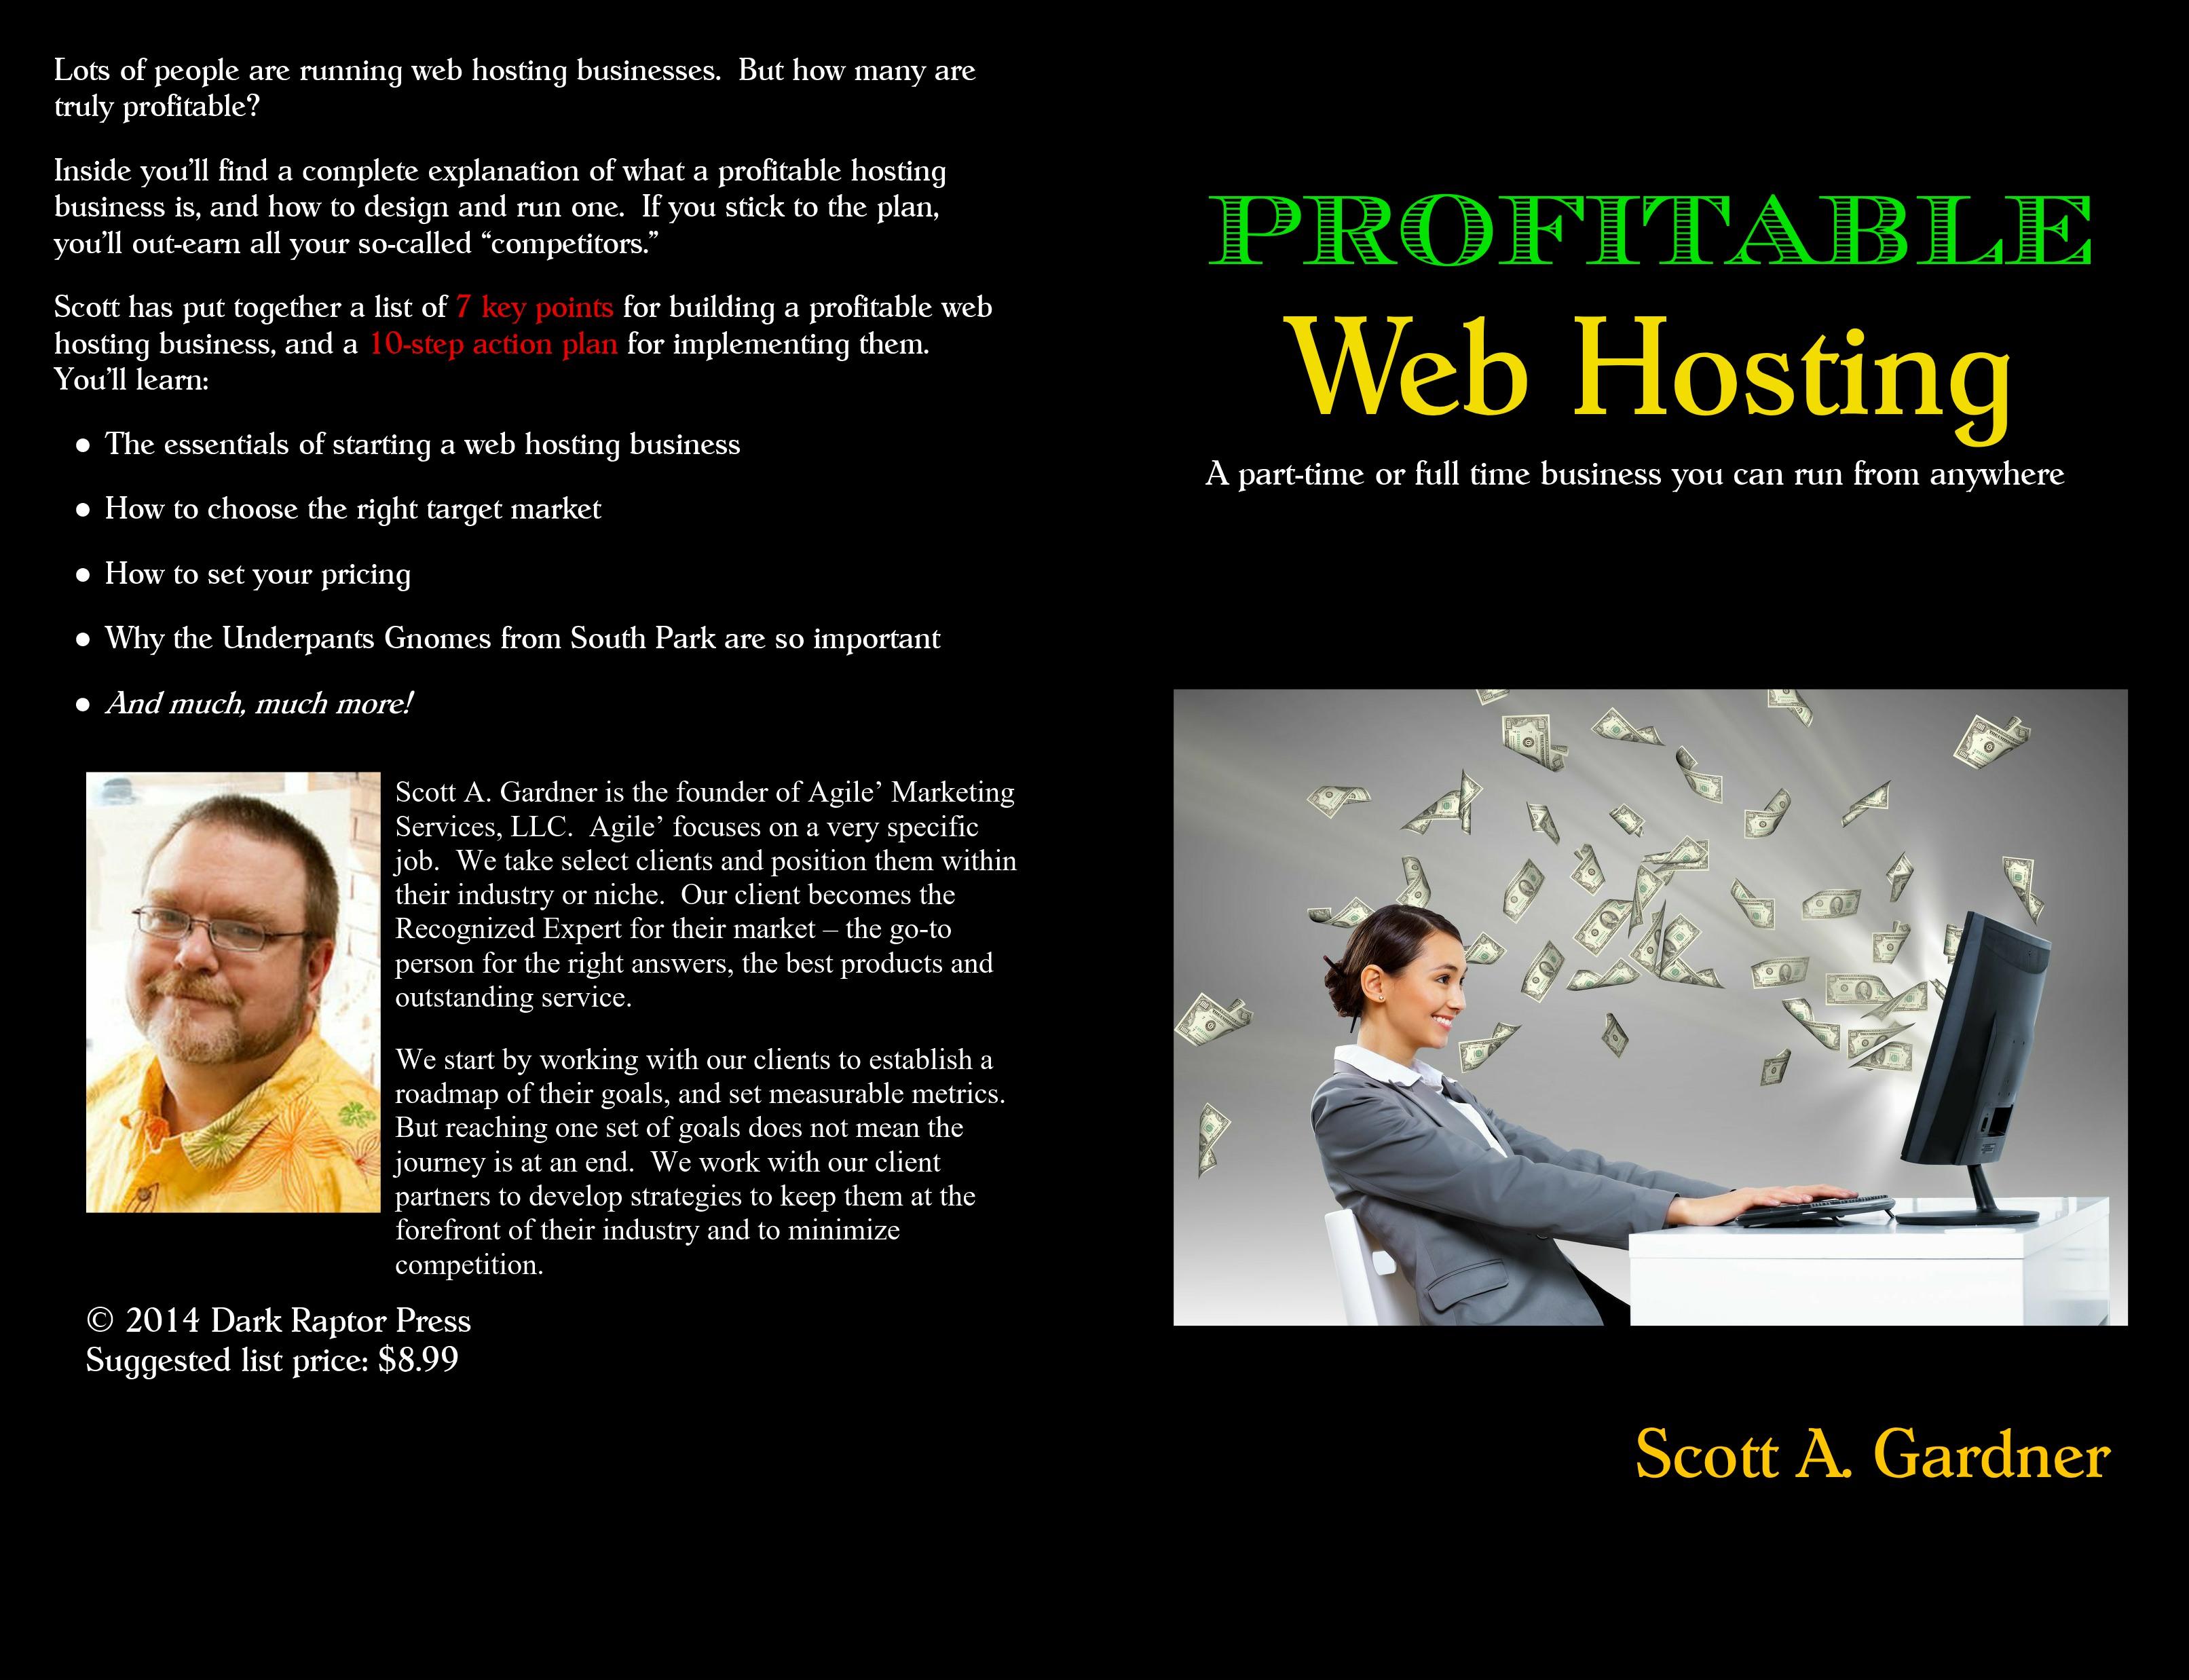 Profitable Web Hosting Image